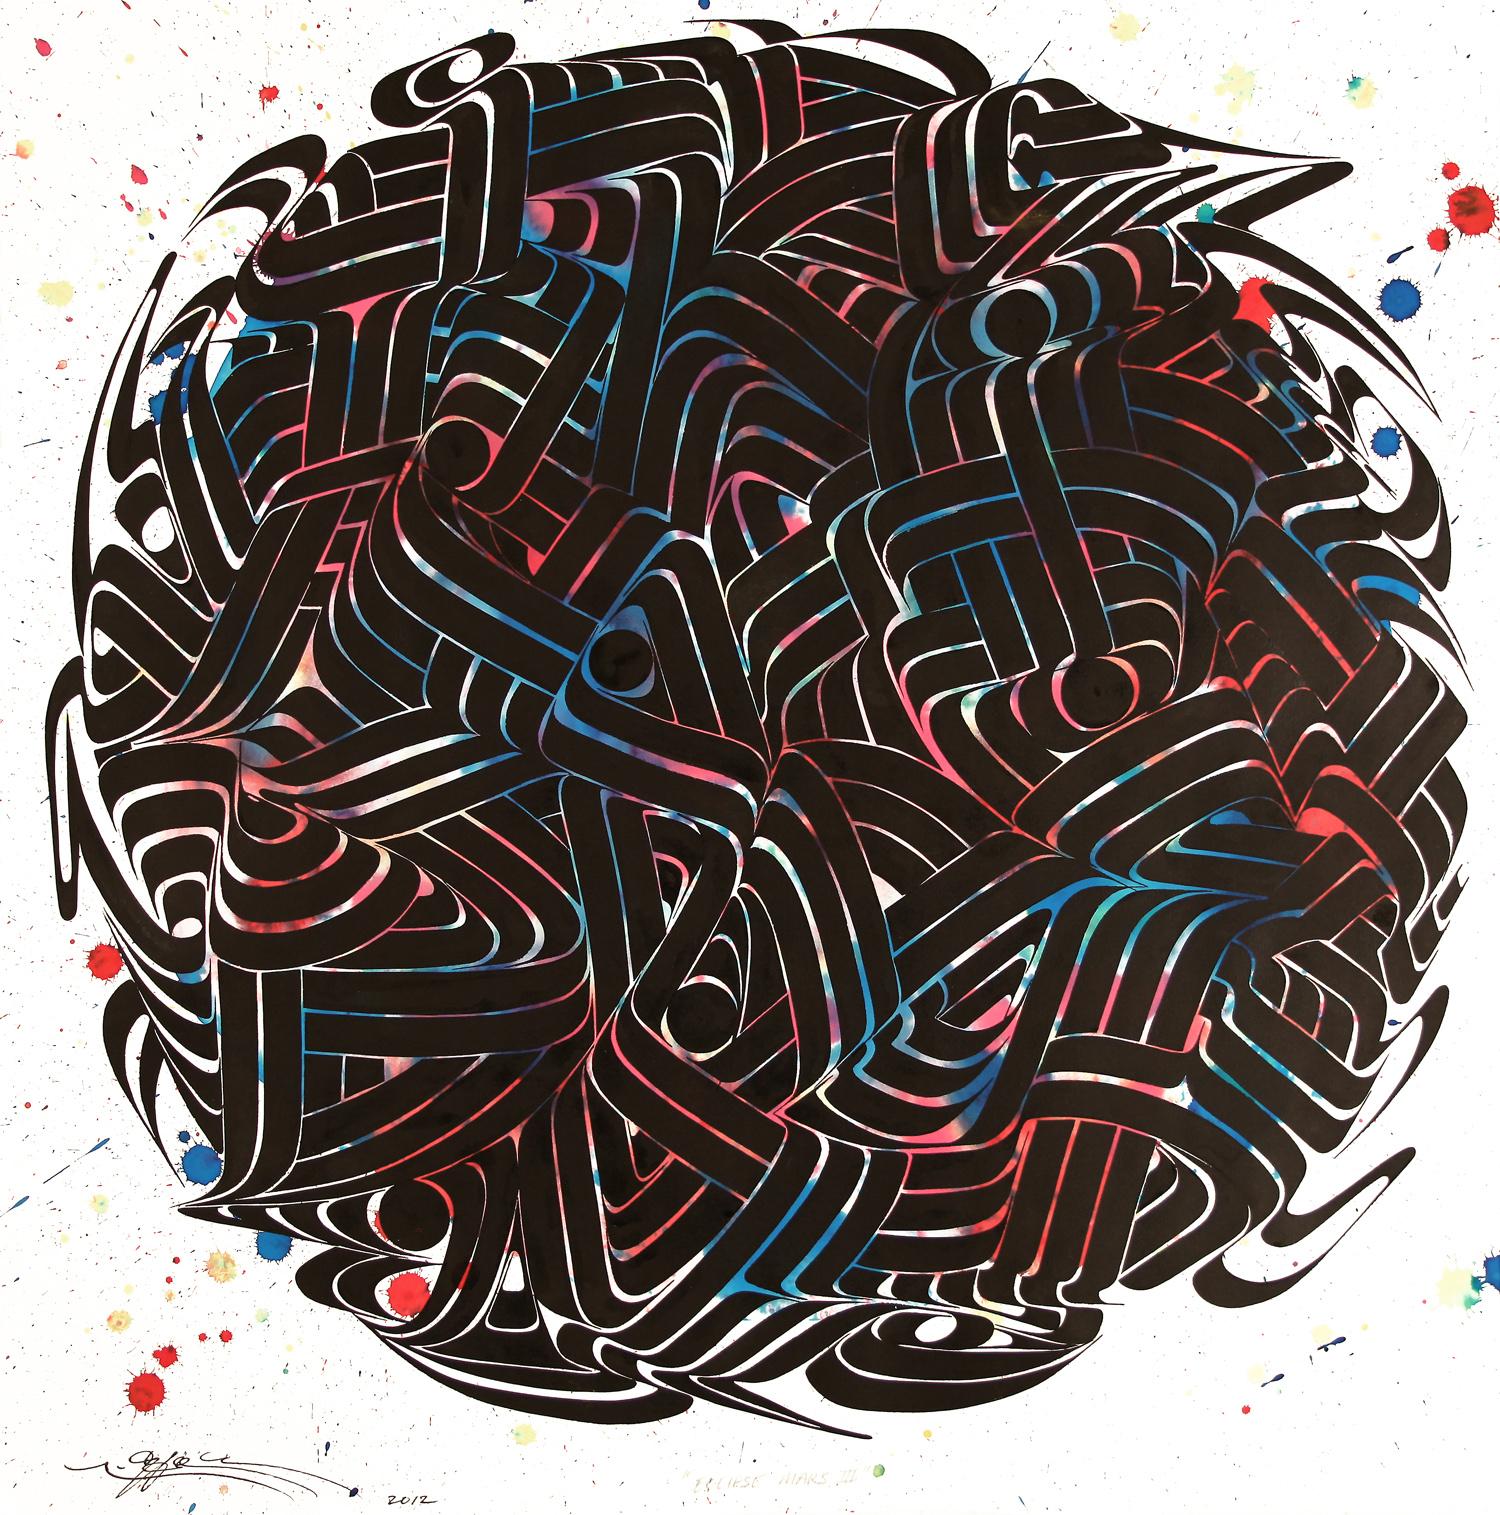 Eclipse Mars III, 2012 ink on handmade paper 29.5 x 29.5 inch